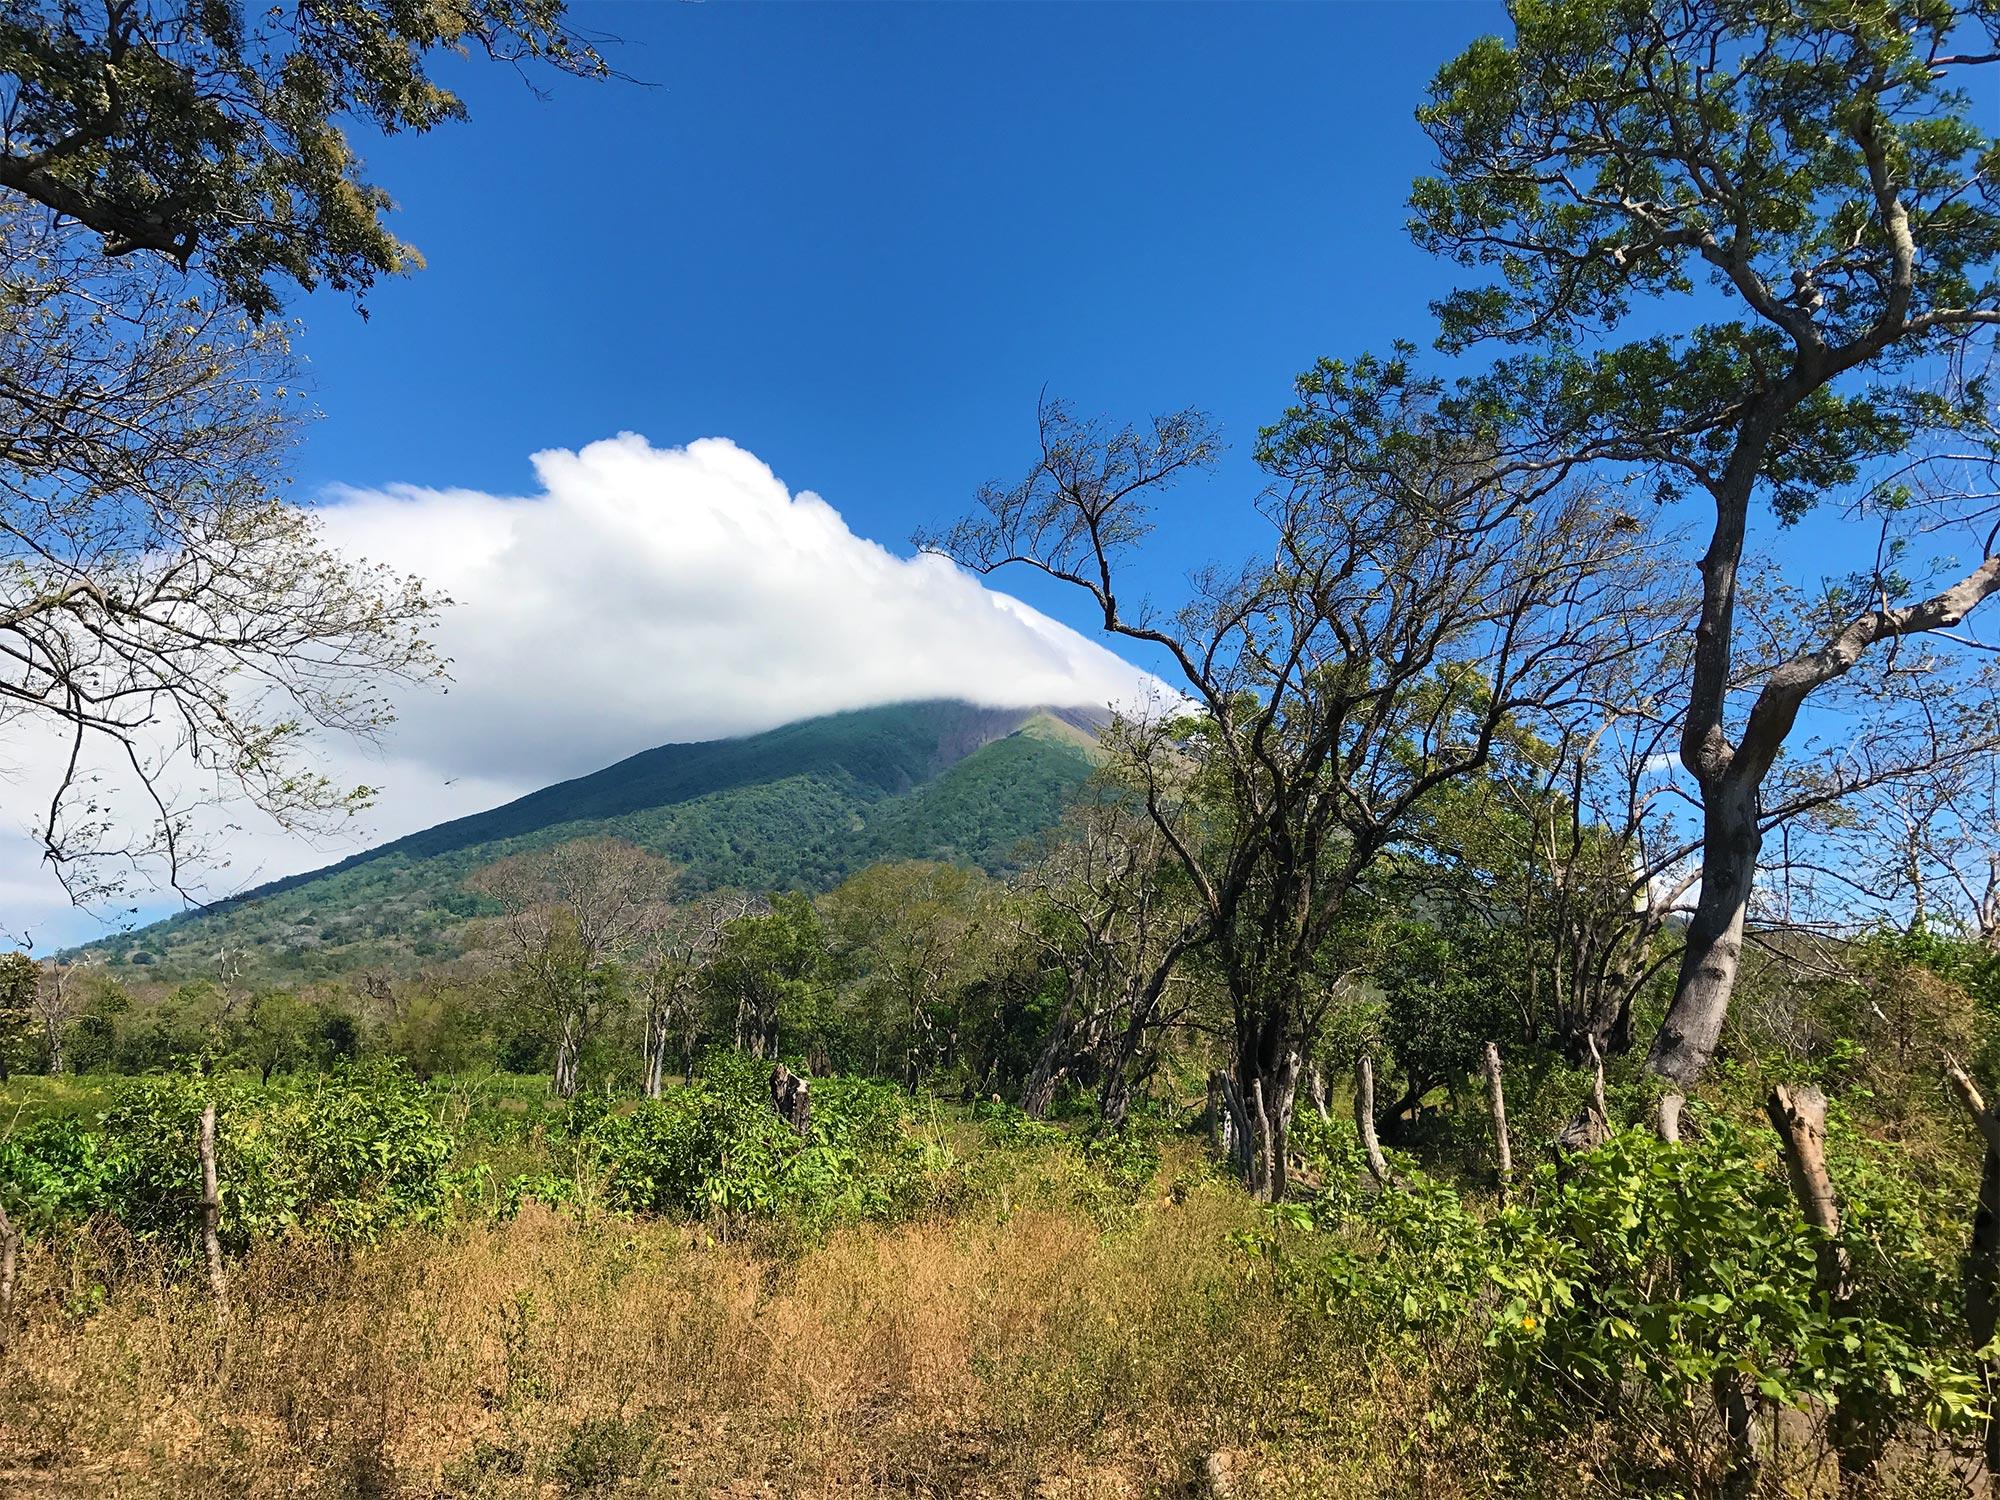 Concepcion volcano - trees and a massive cloud at it's peak